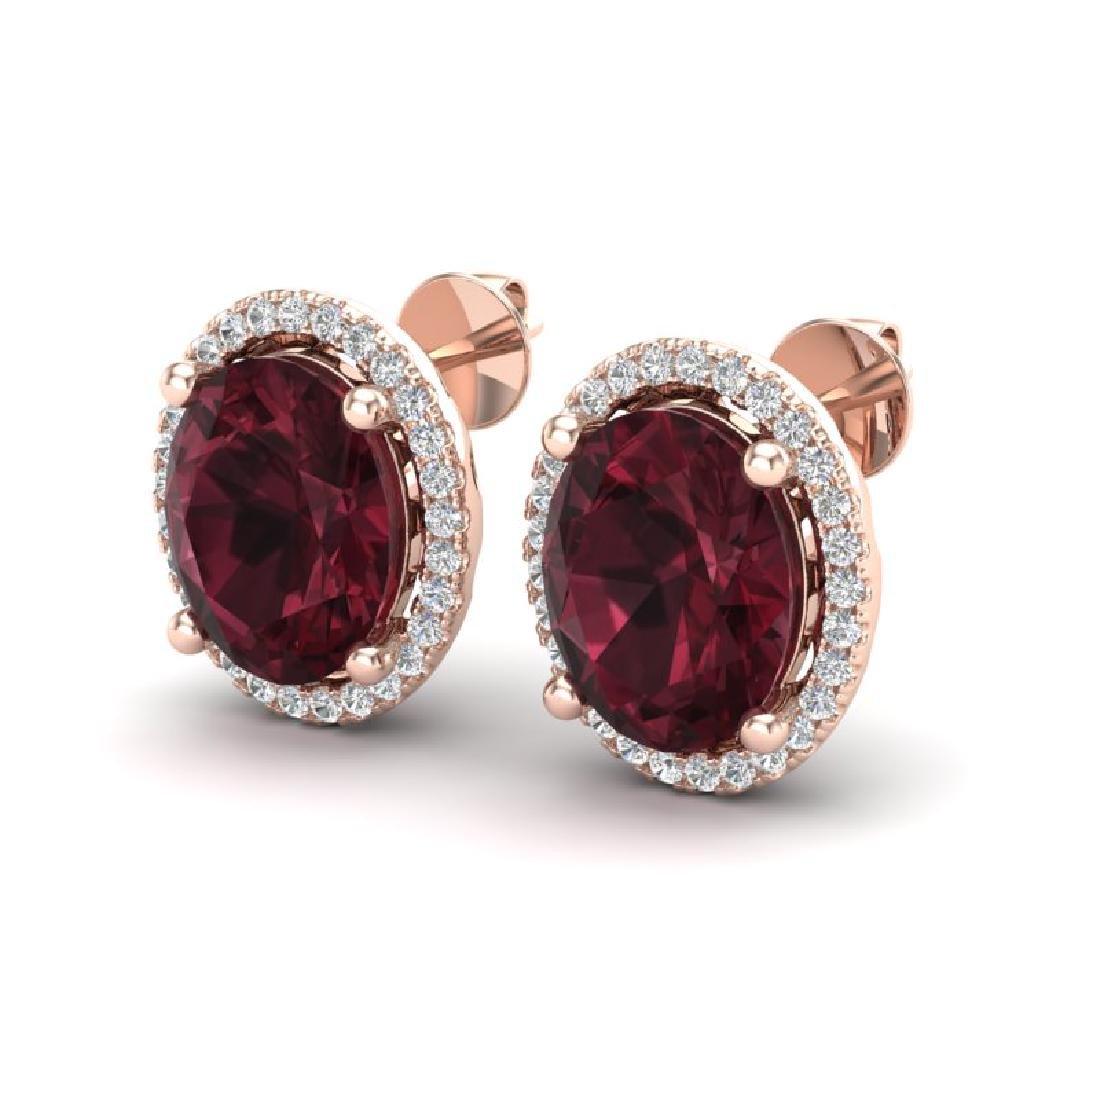 5 CTW Garnet & Micro Pave VS/SI Diamond Earrings Halo